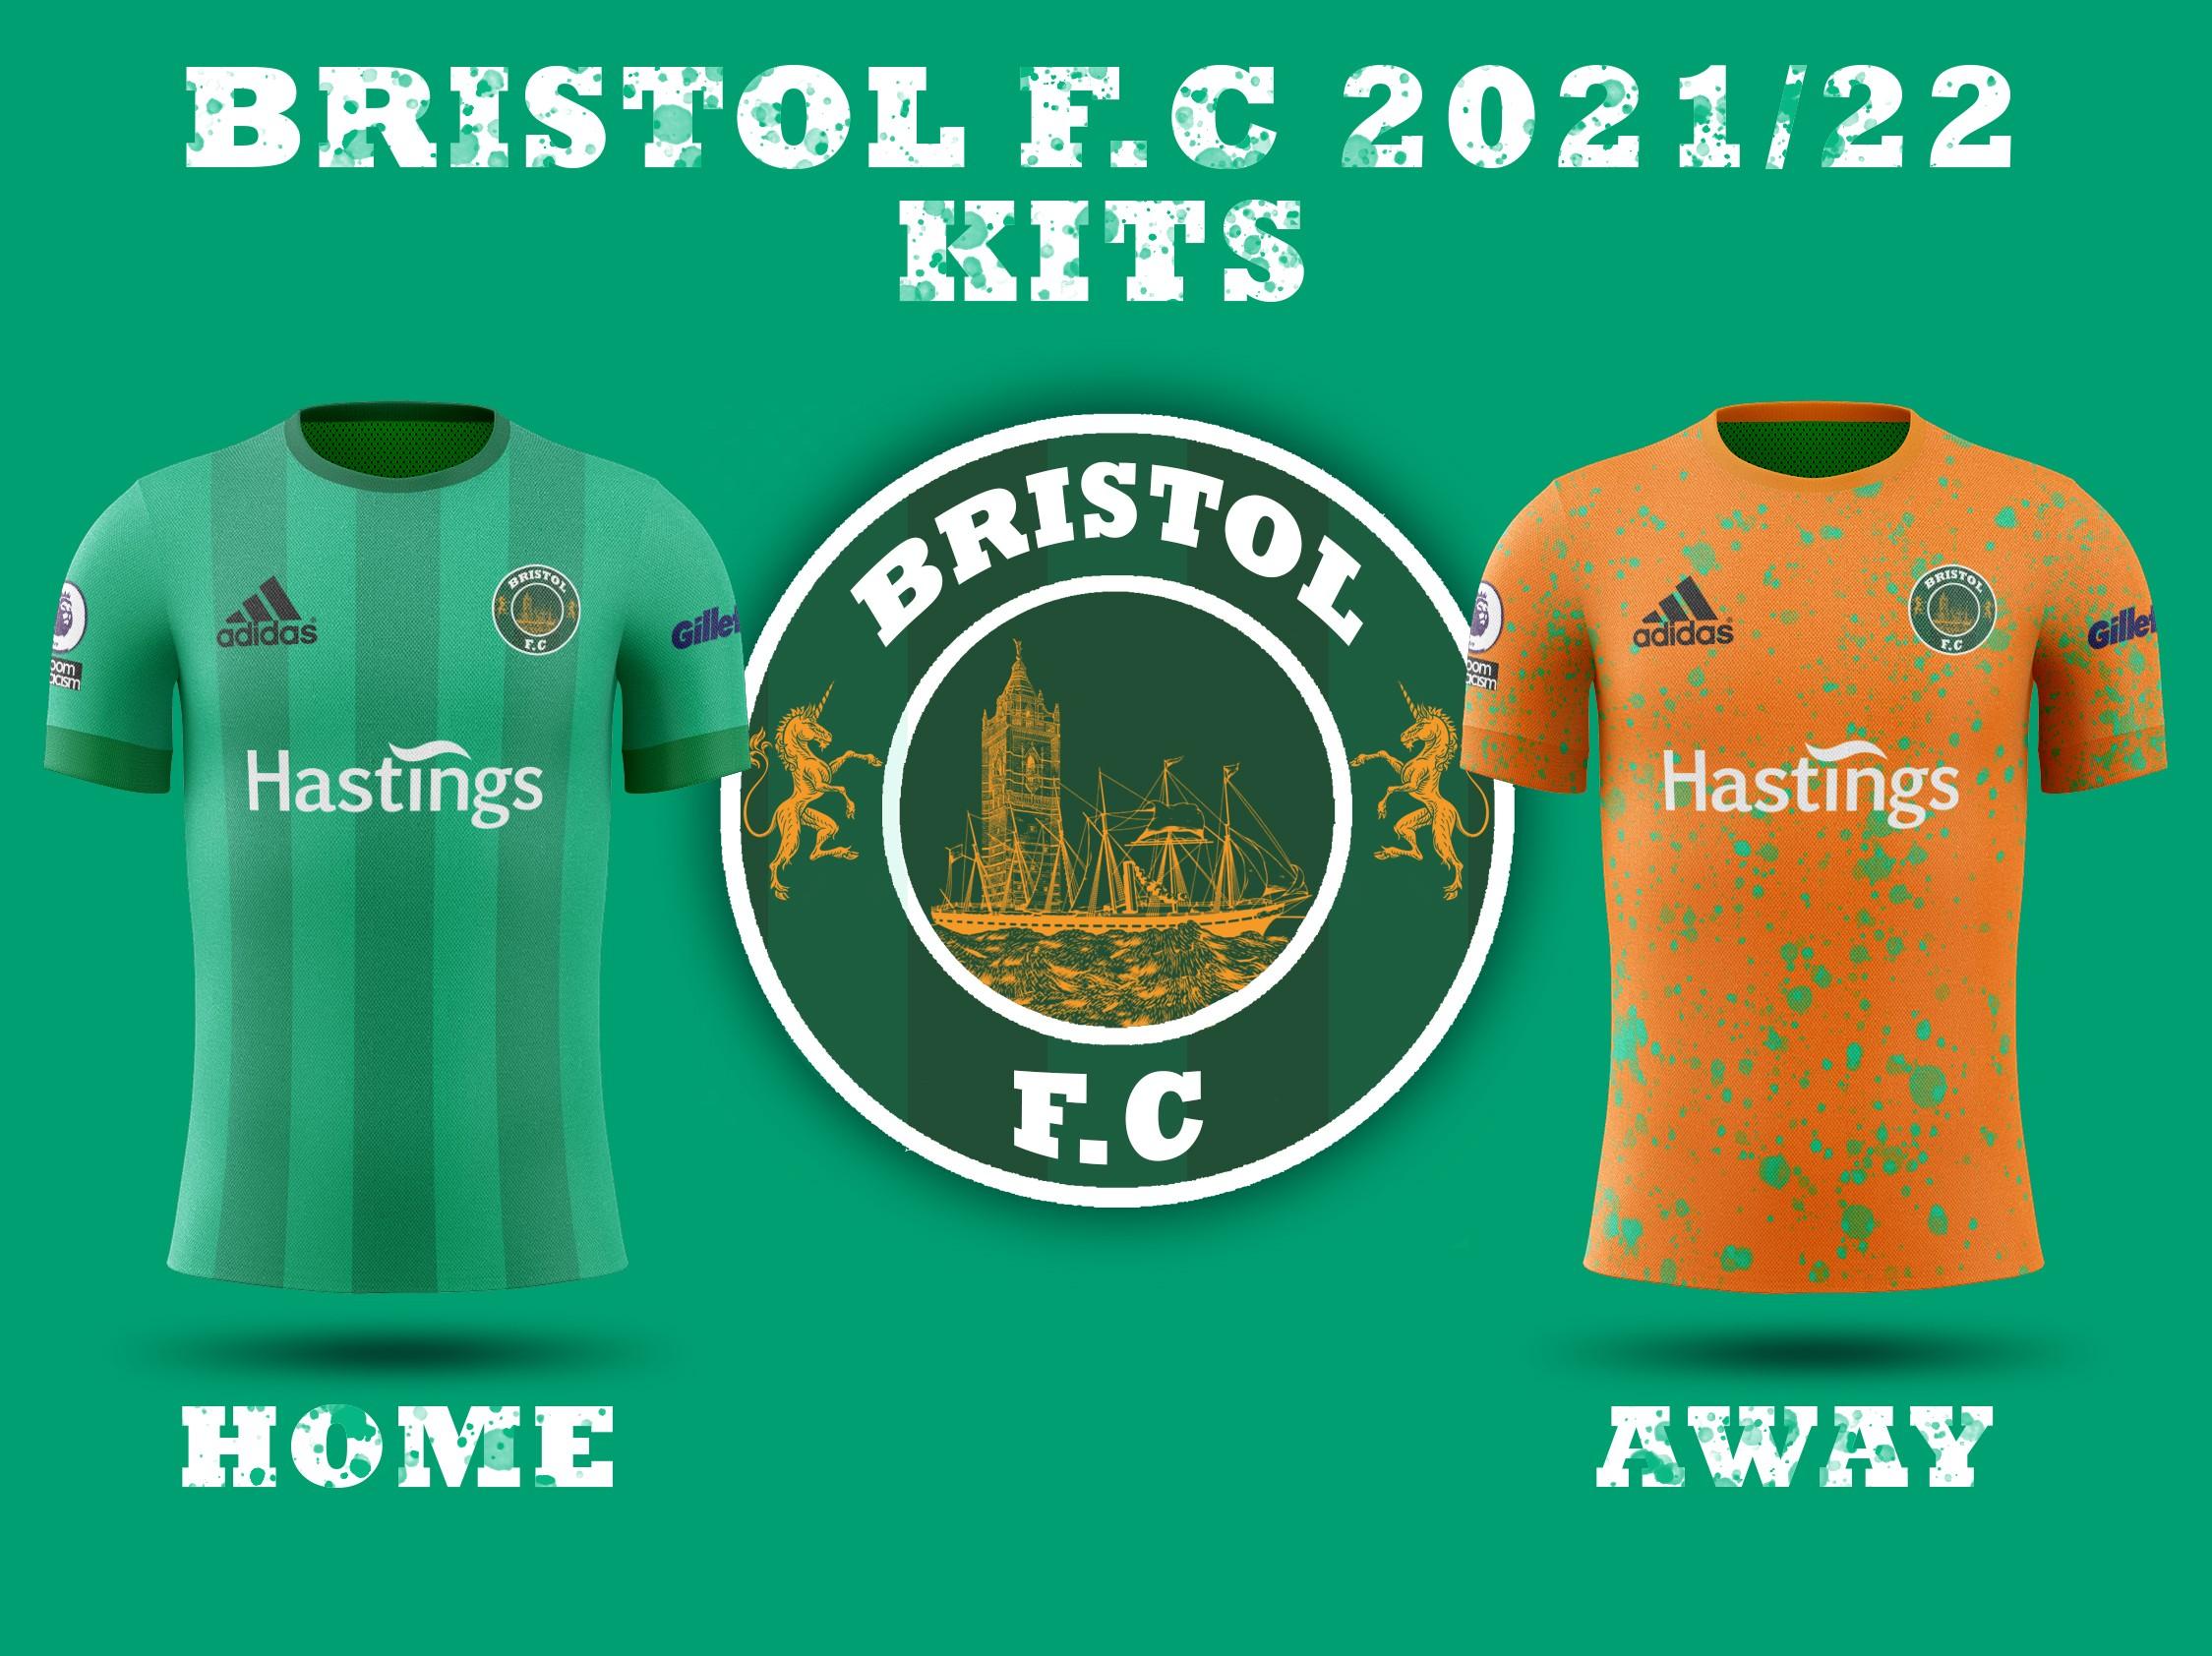 bristol fc home and away.jpg